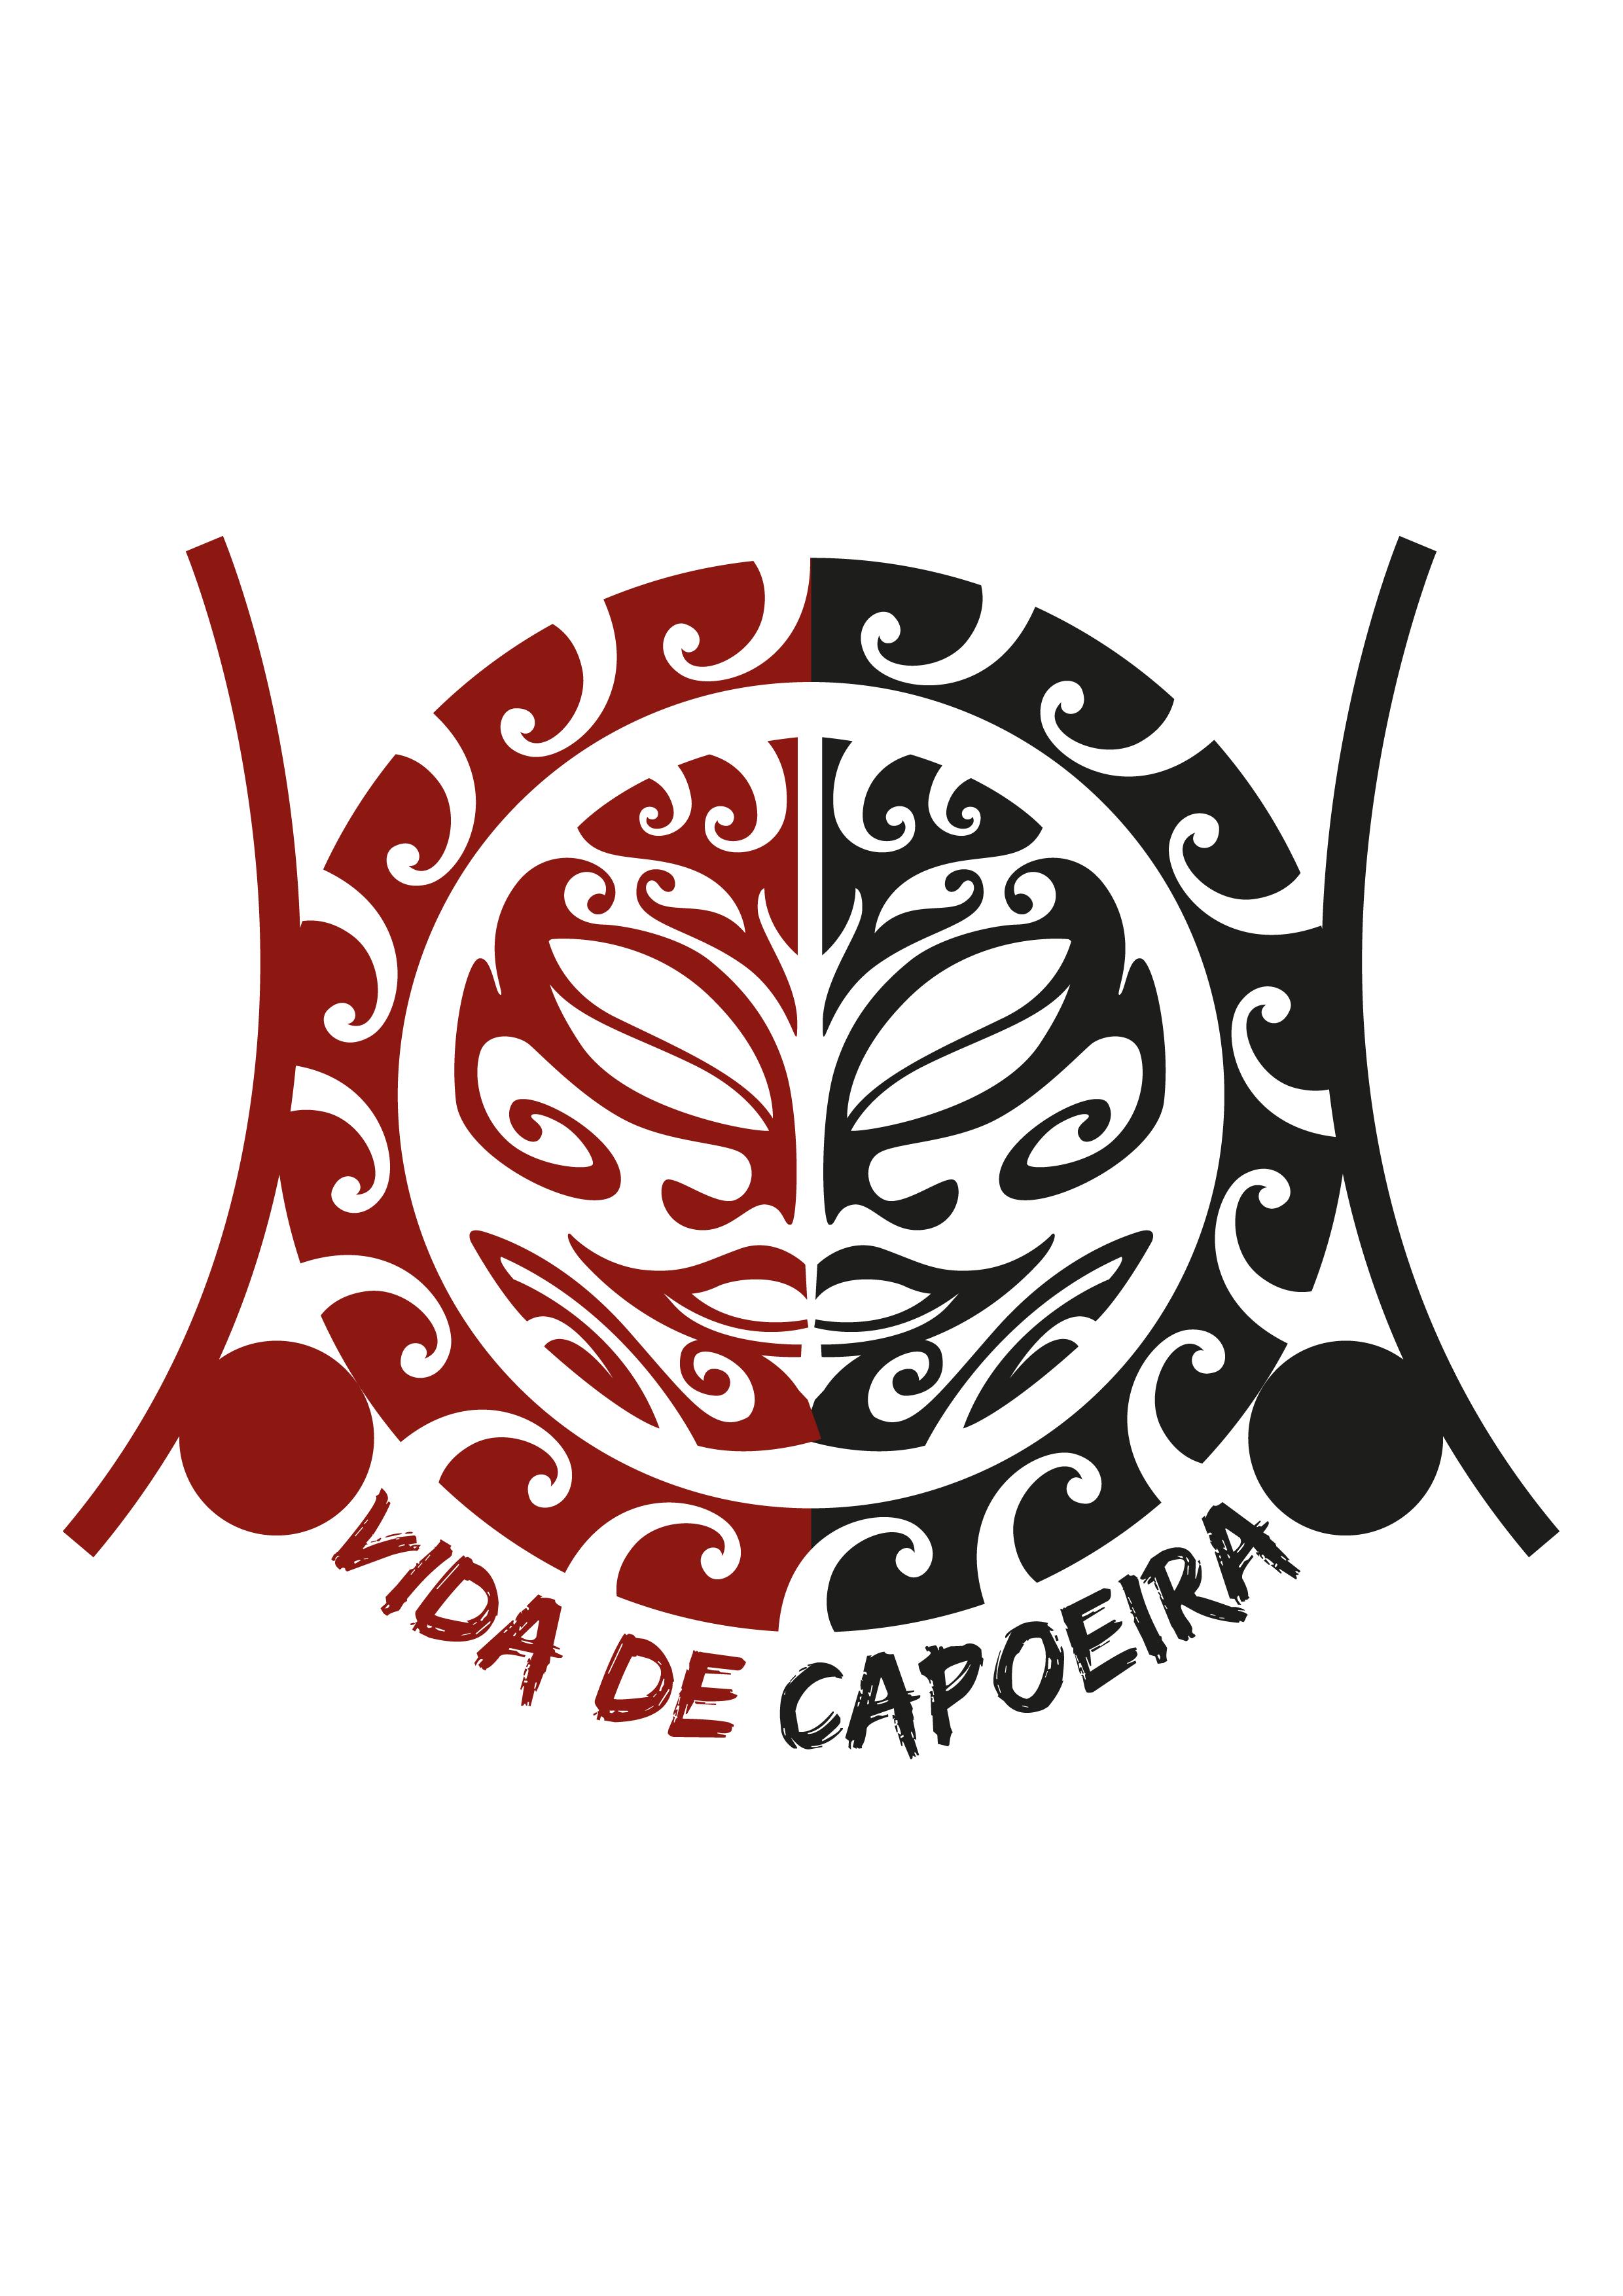 Vida de Capoeira